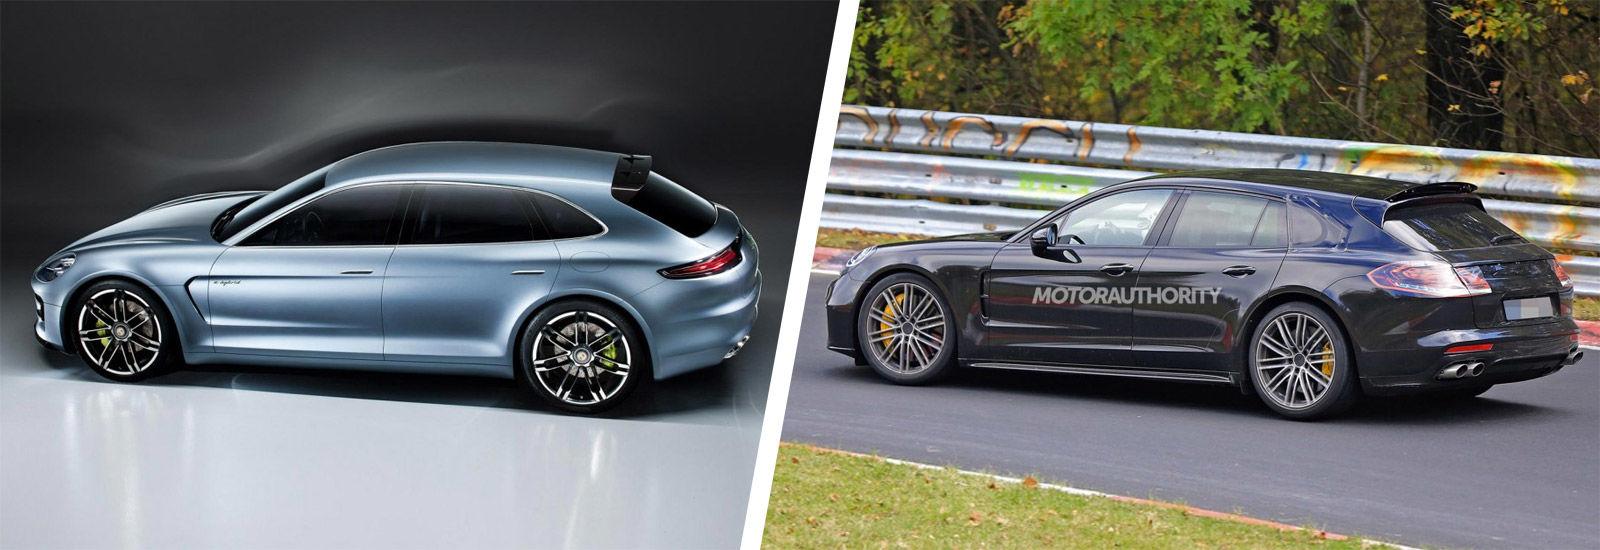 2018 Porsche Panamera Shooting Brake Styling